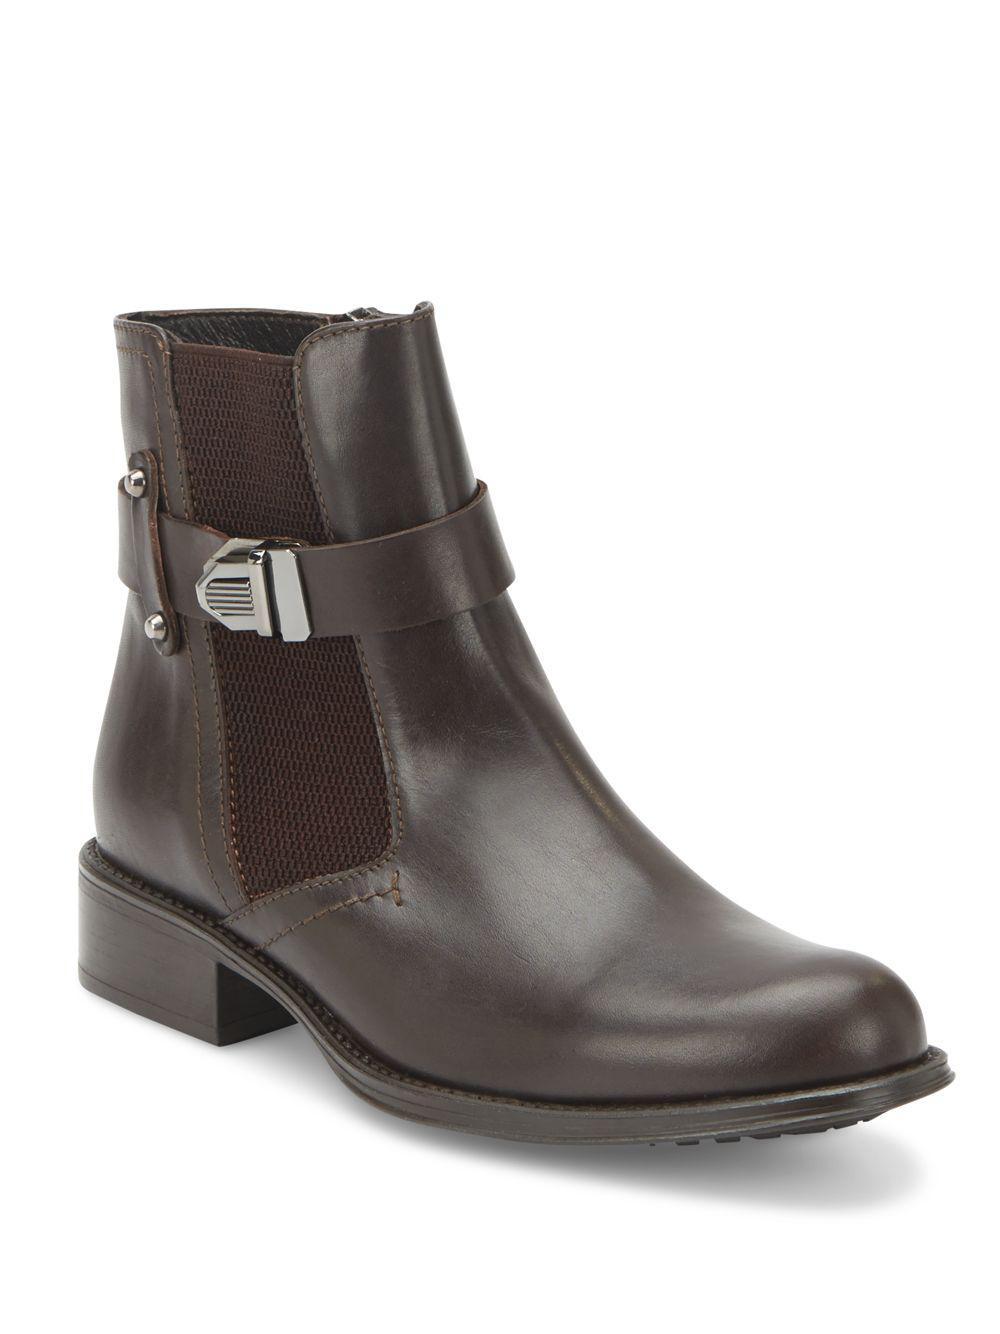 Aquatalia Emery Leather Booties excellent cheap price uSw9M5M